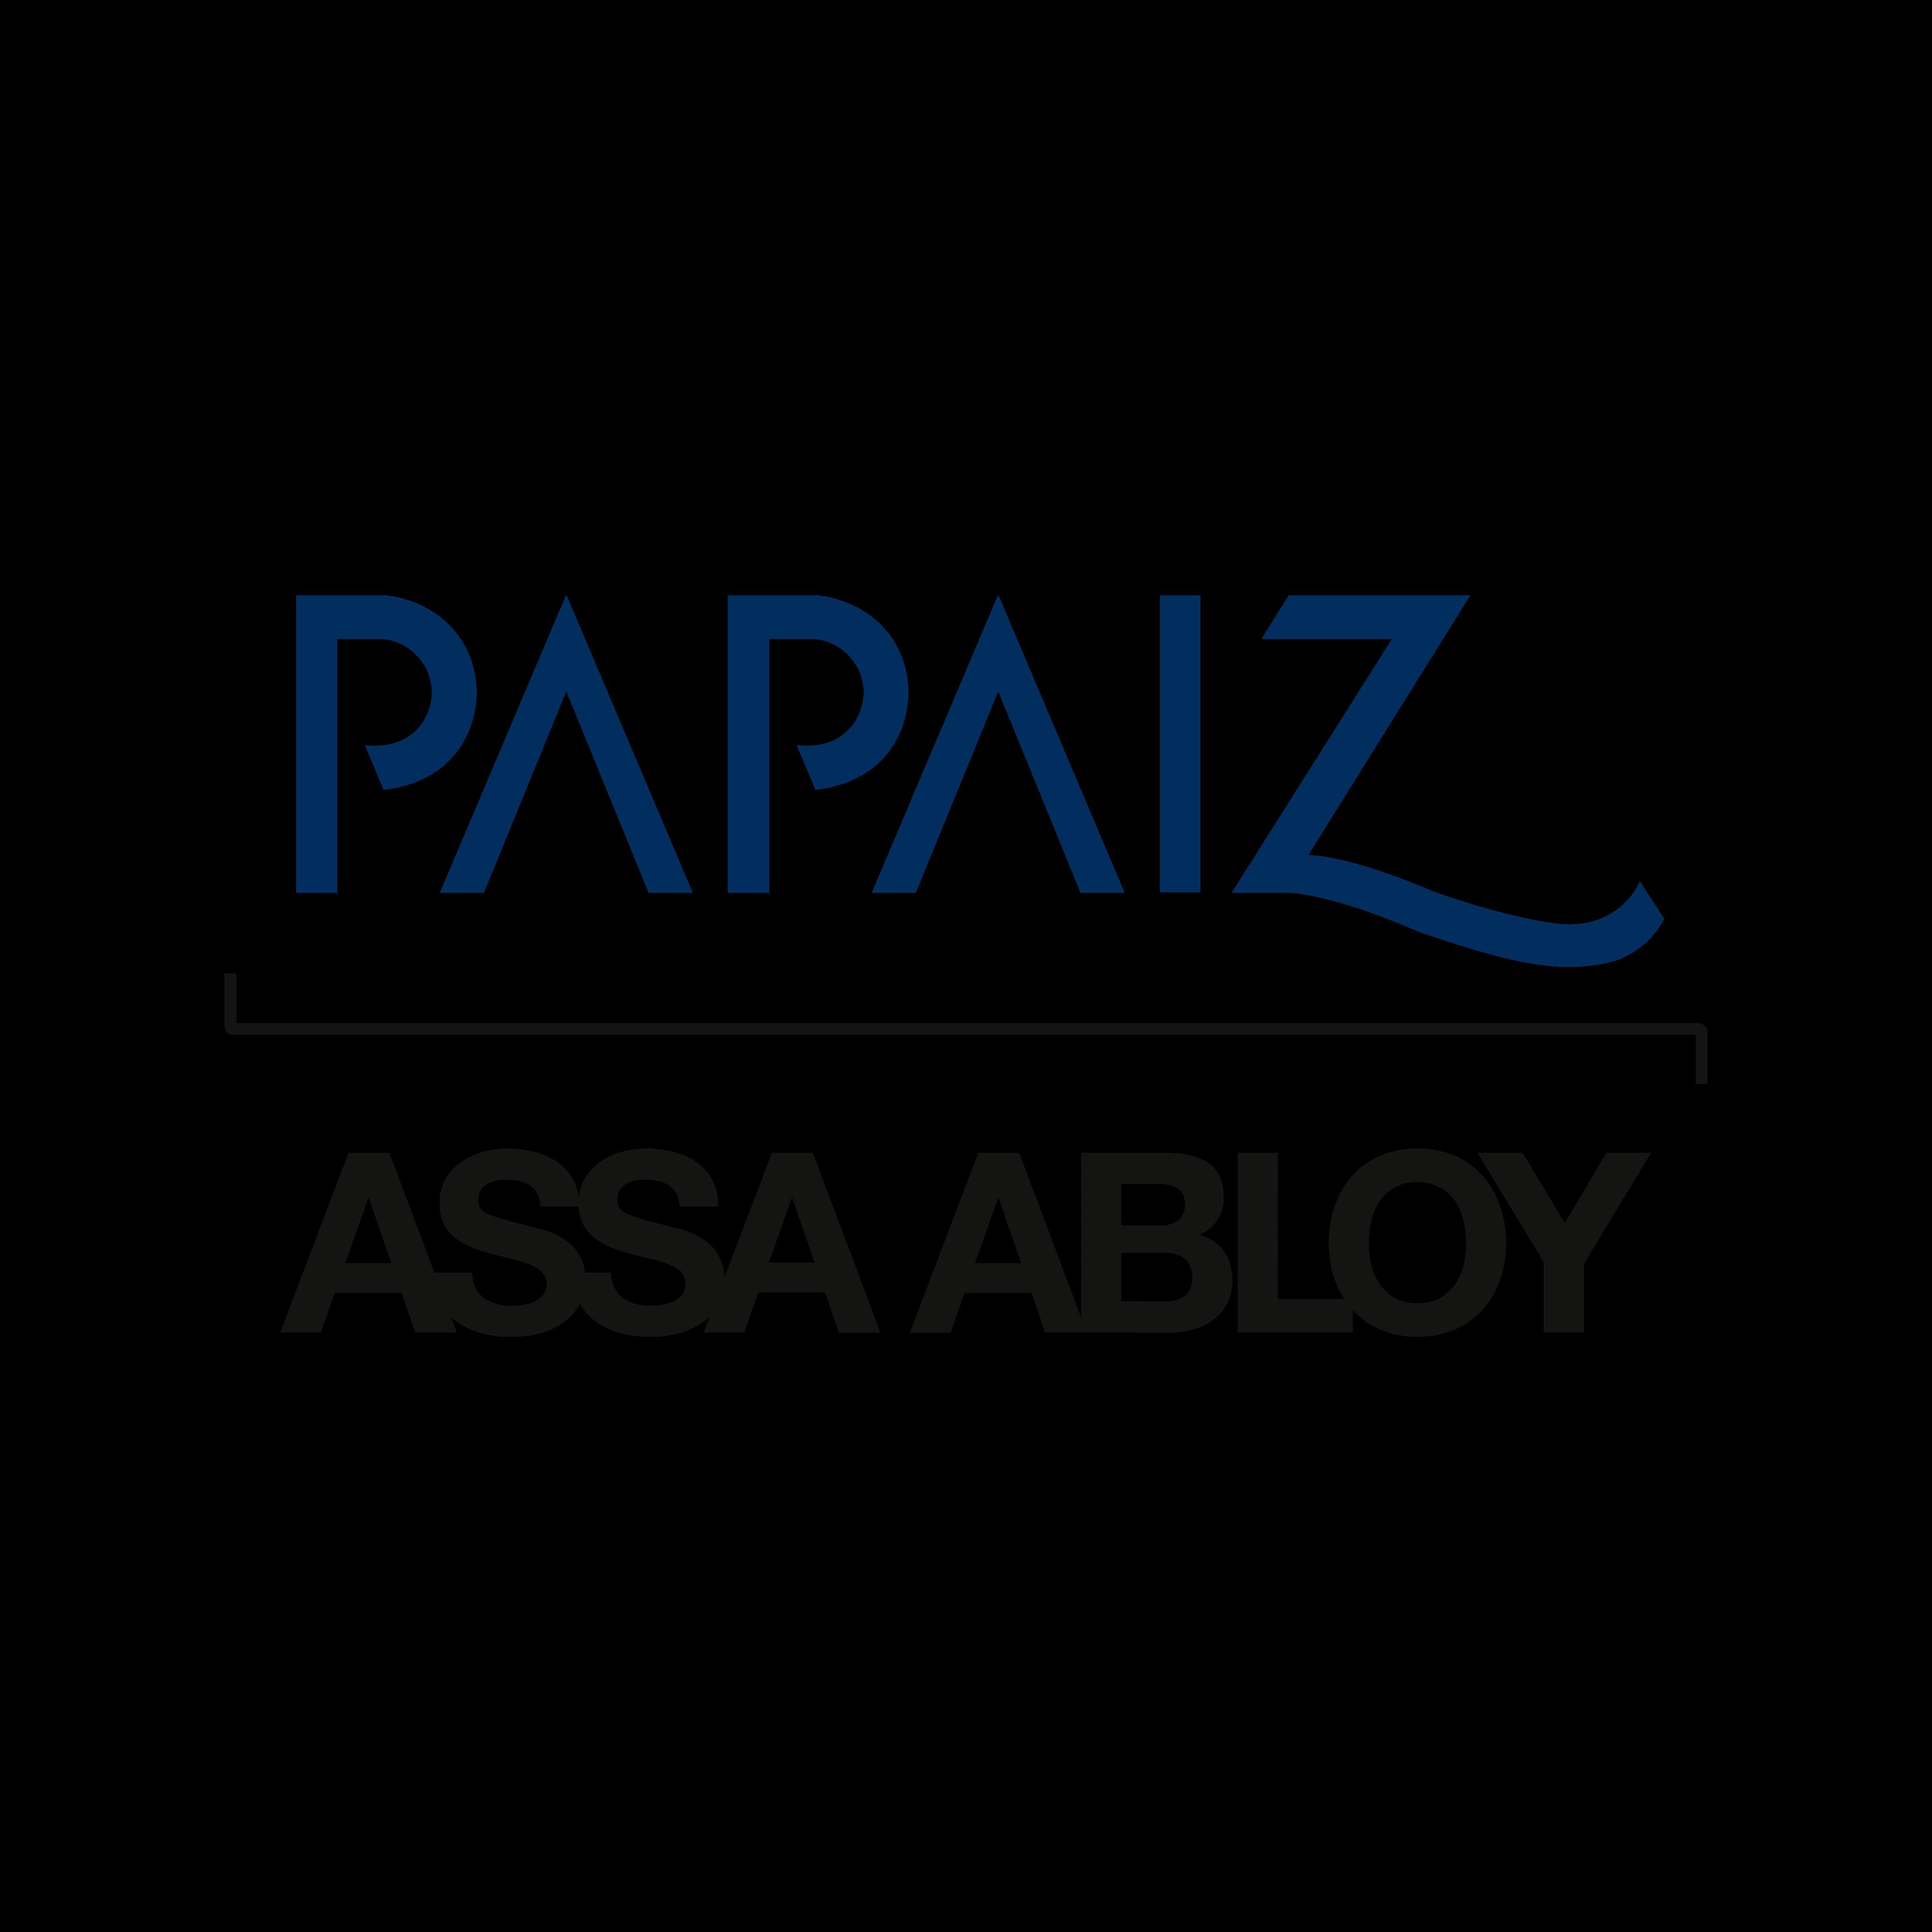 papaiz logo 0 - Papaiz Logo